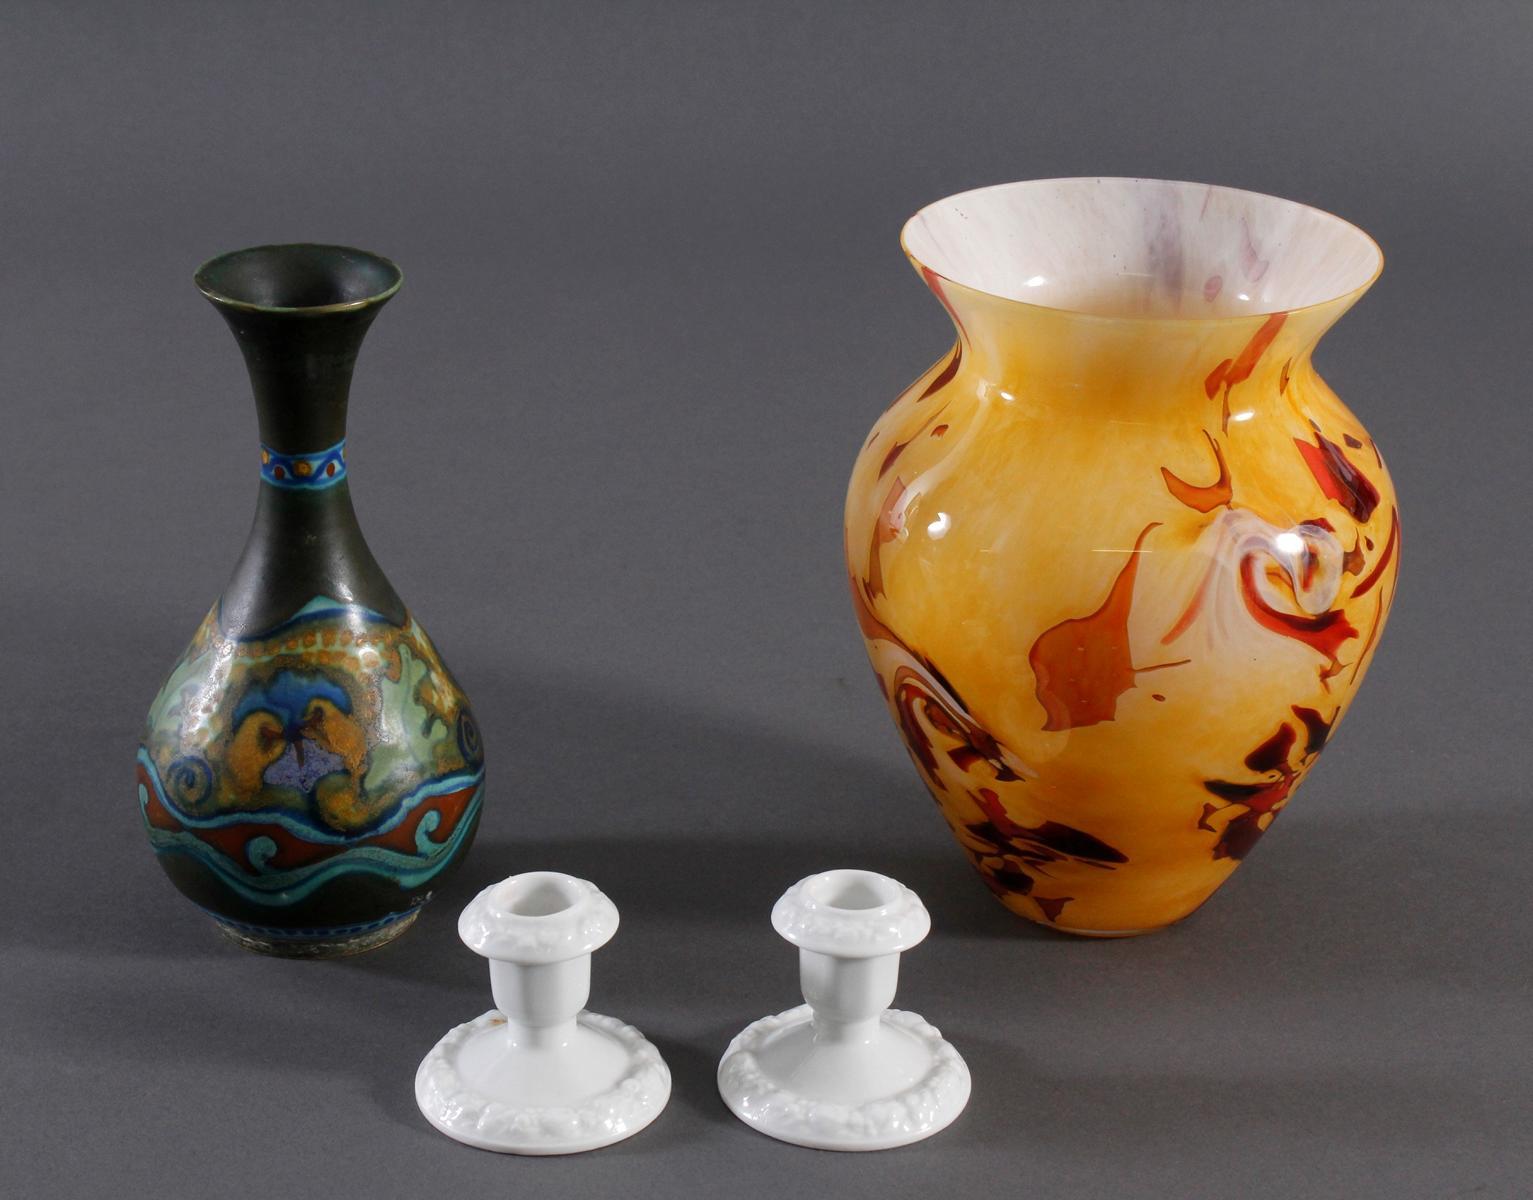 Posten Glas-Porzellan/Keramik-2